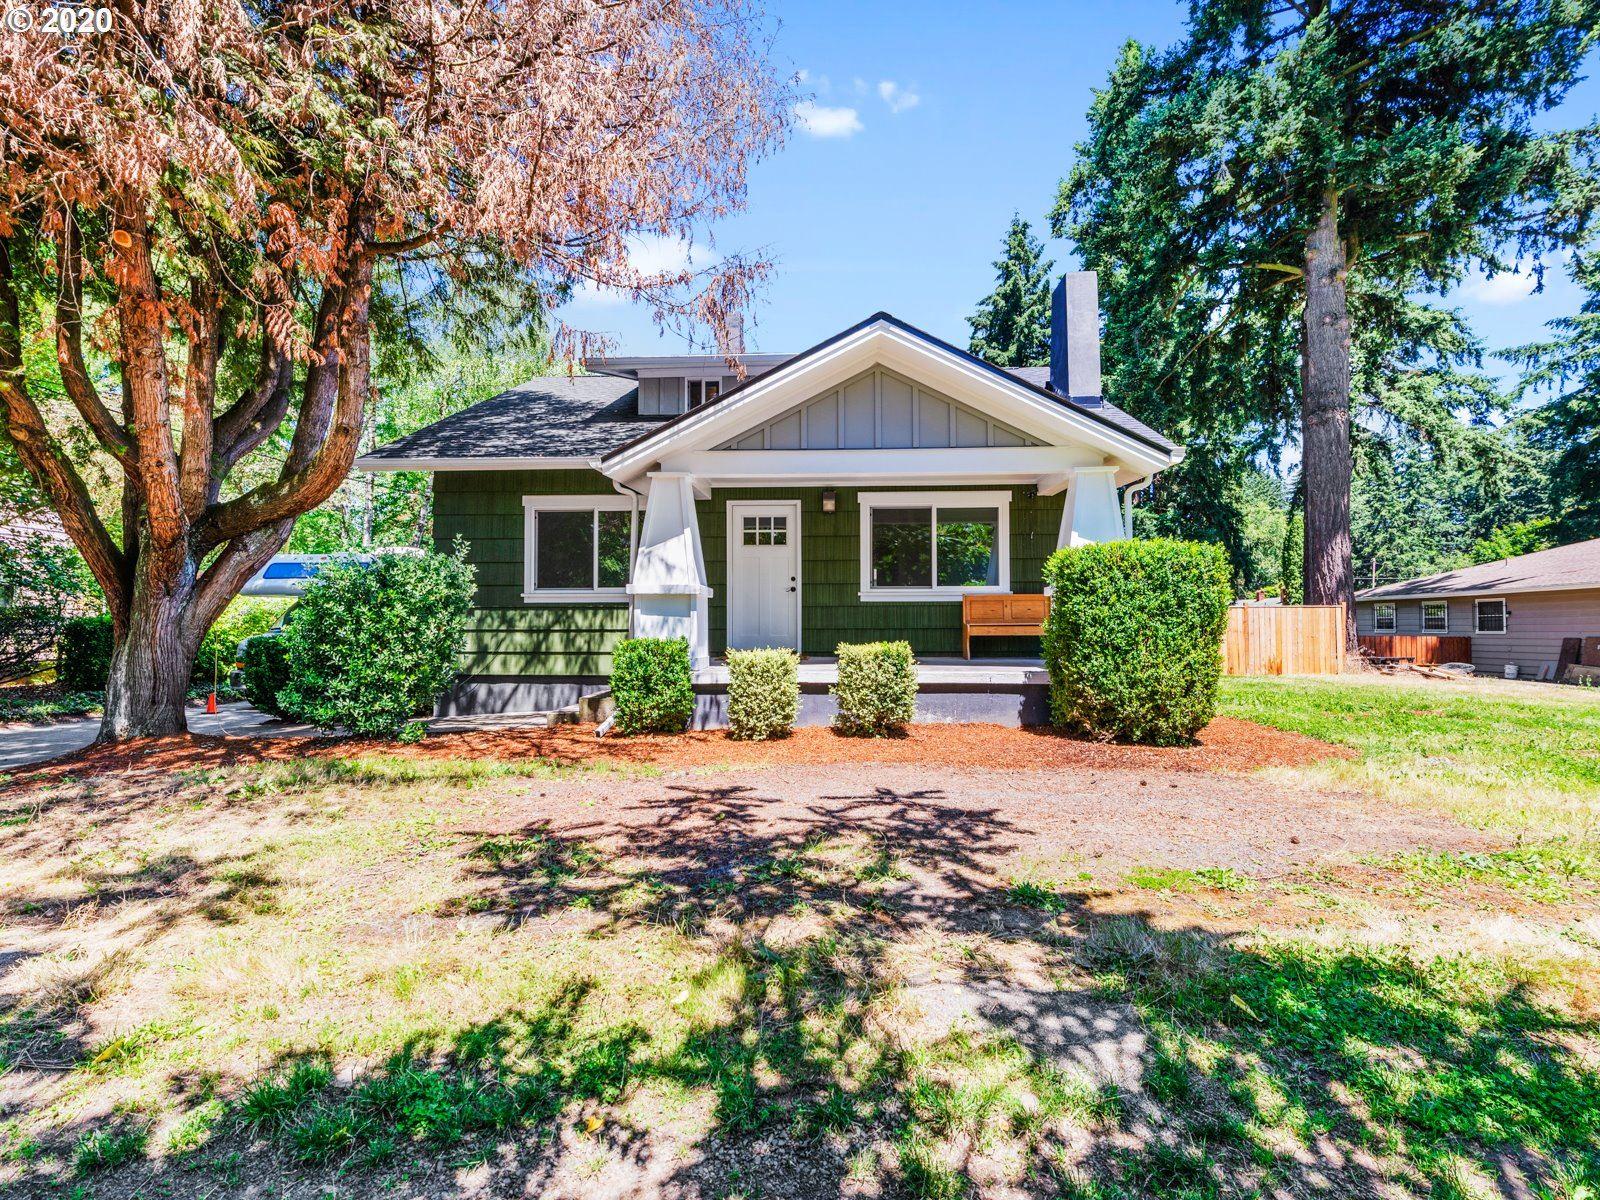 11557 SE POWELL BLVD, Portland, OR 97266 - MLS#: 20647278